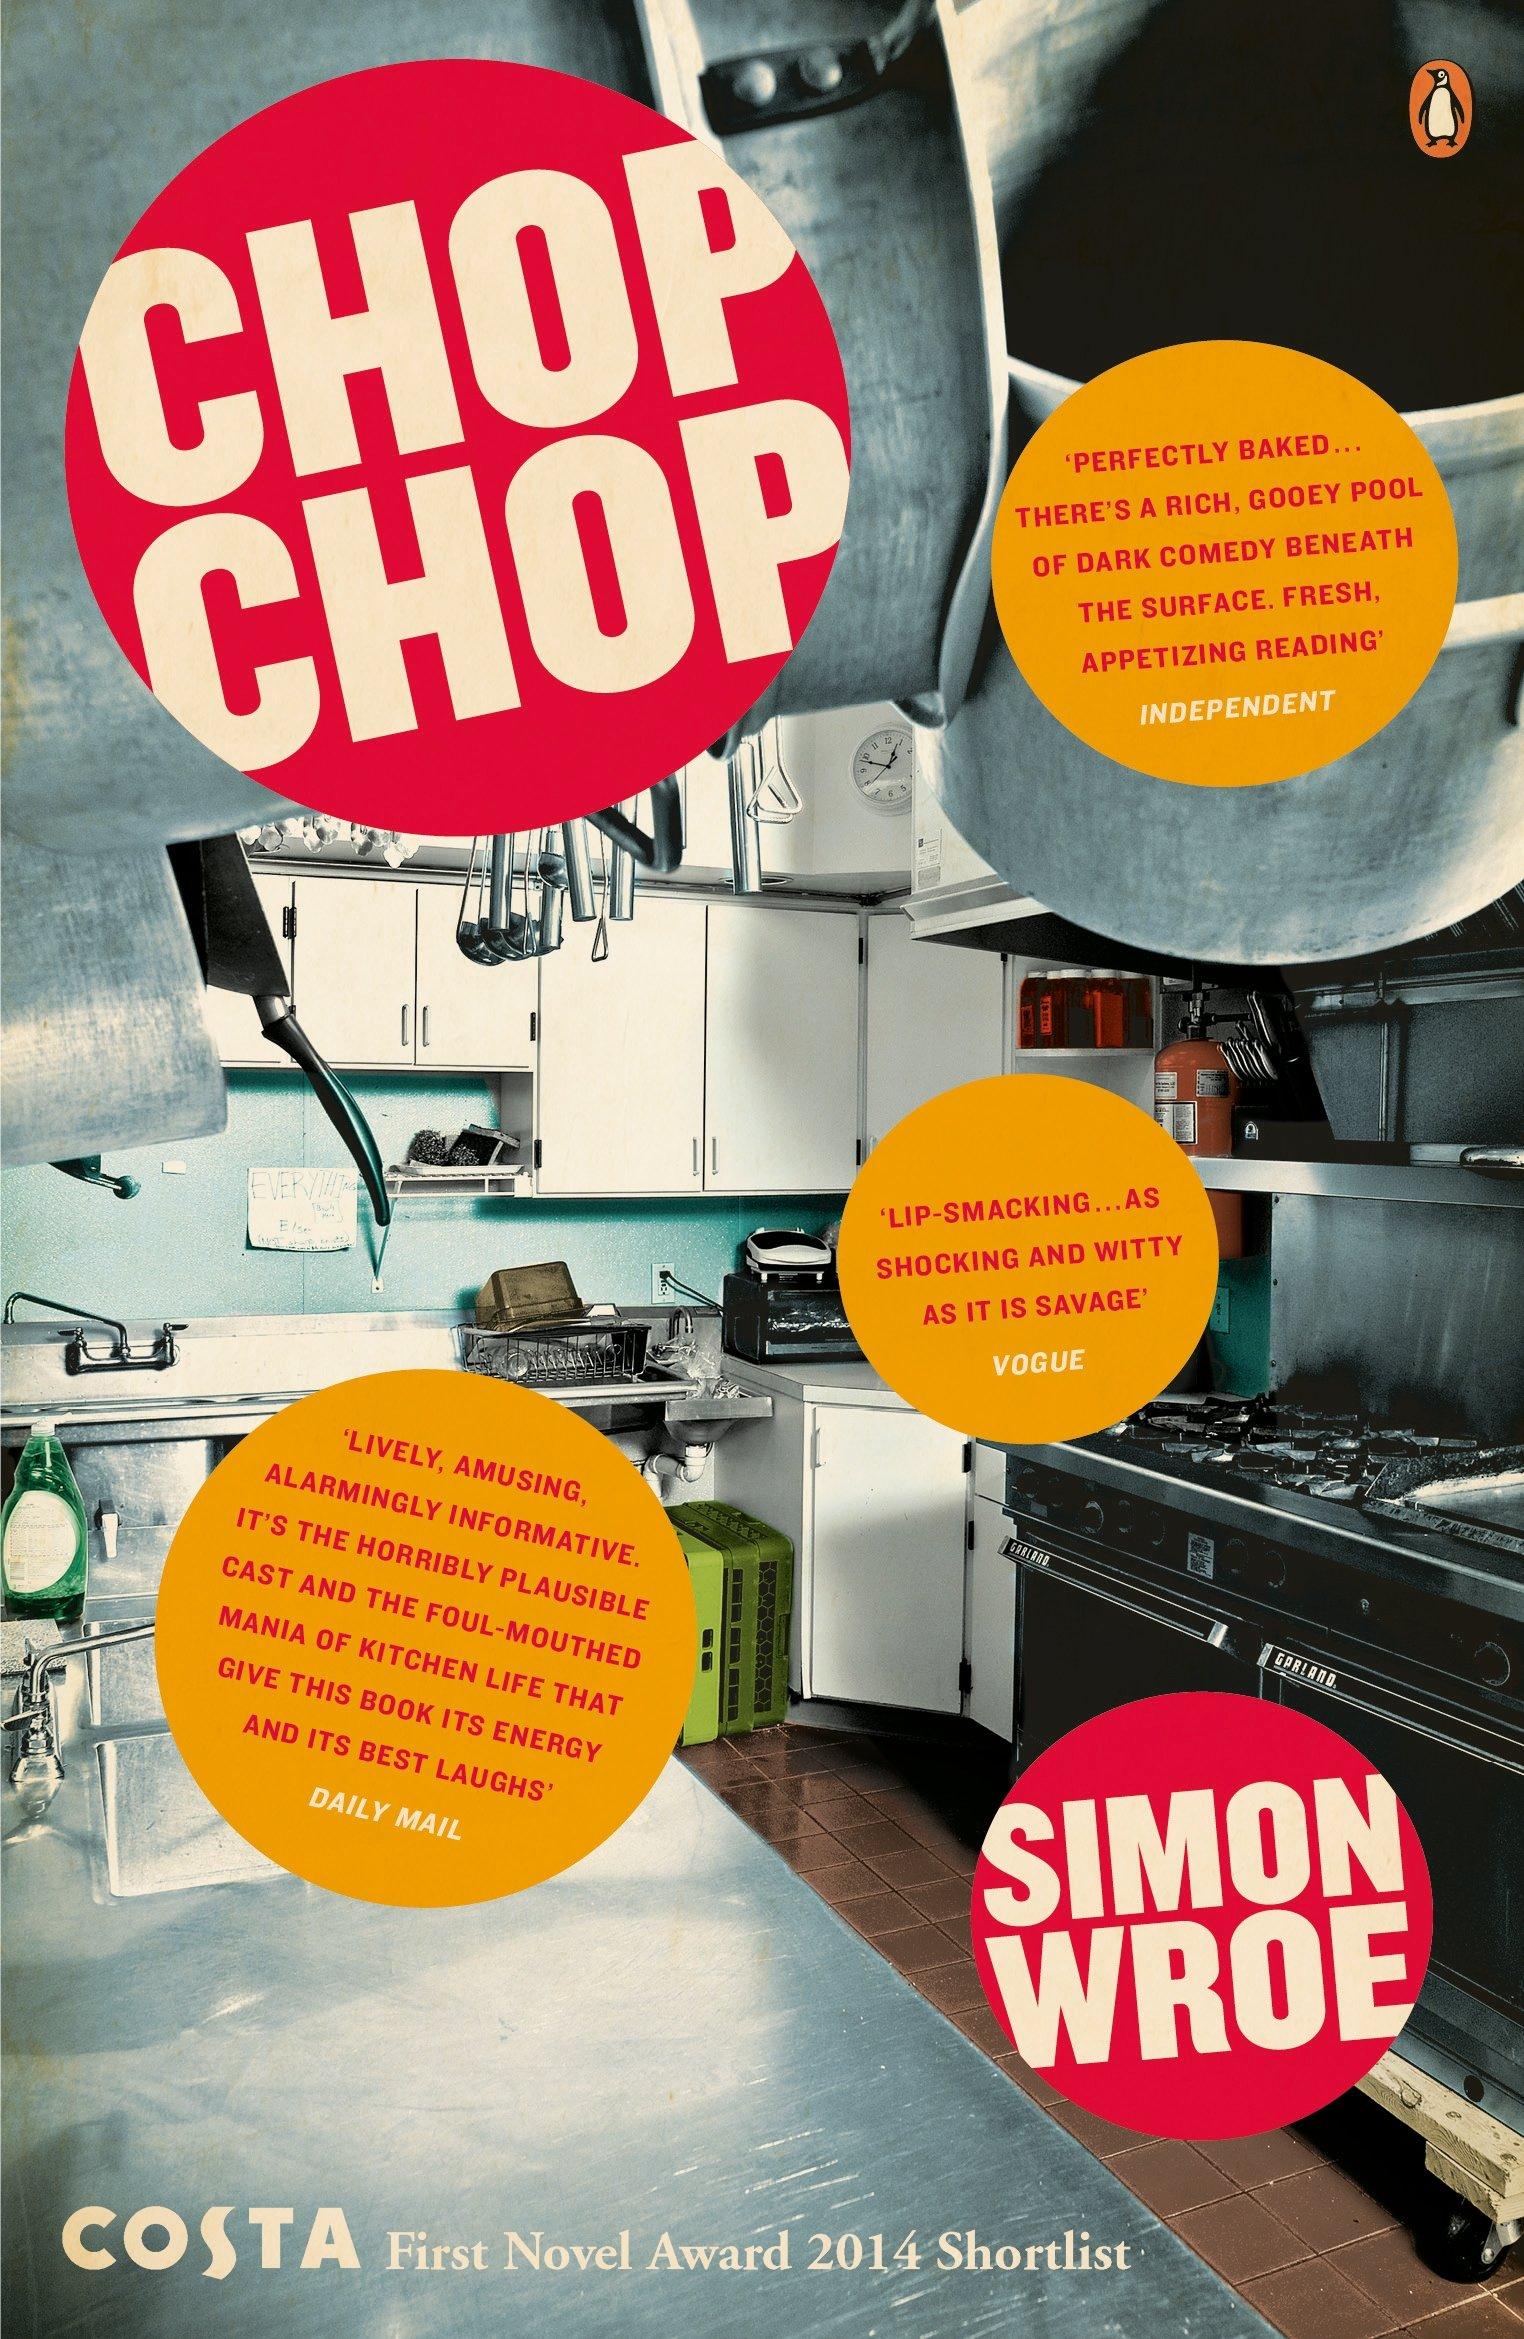 chop chop simon wroe books